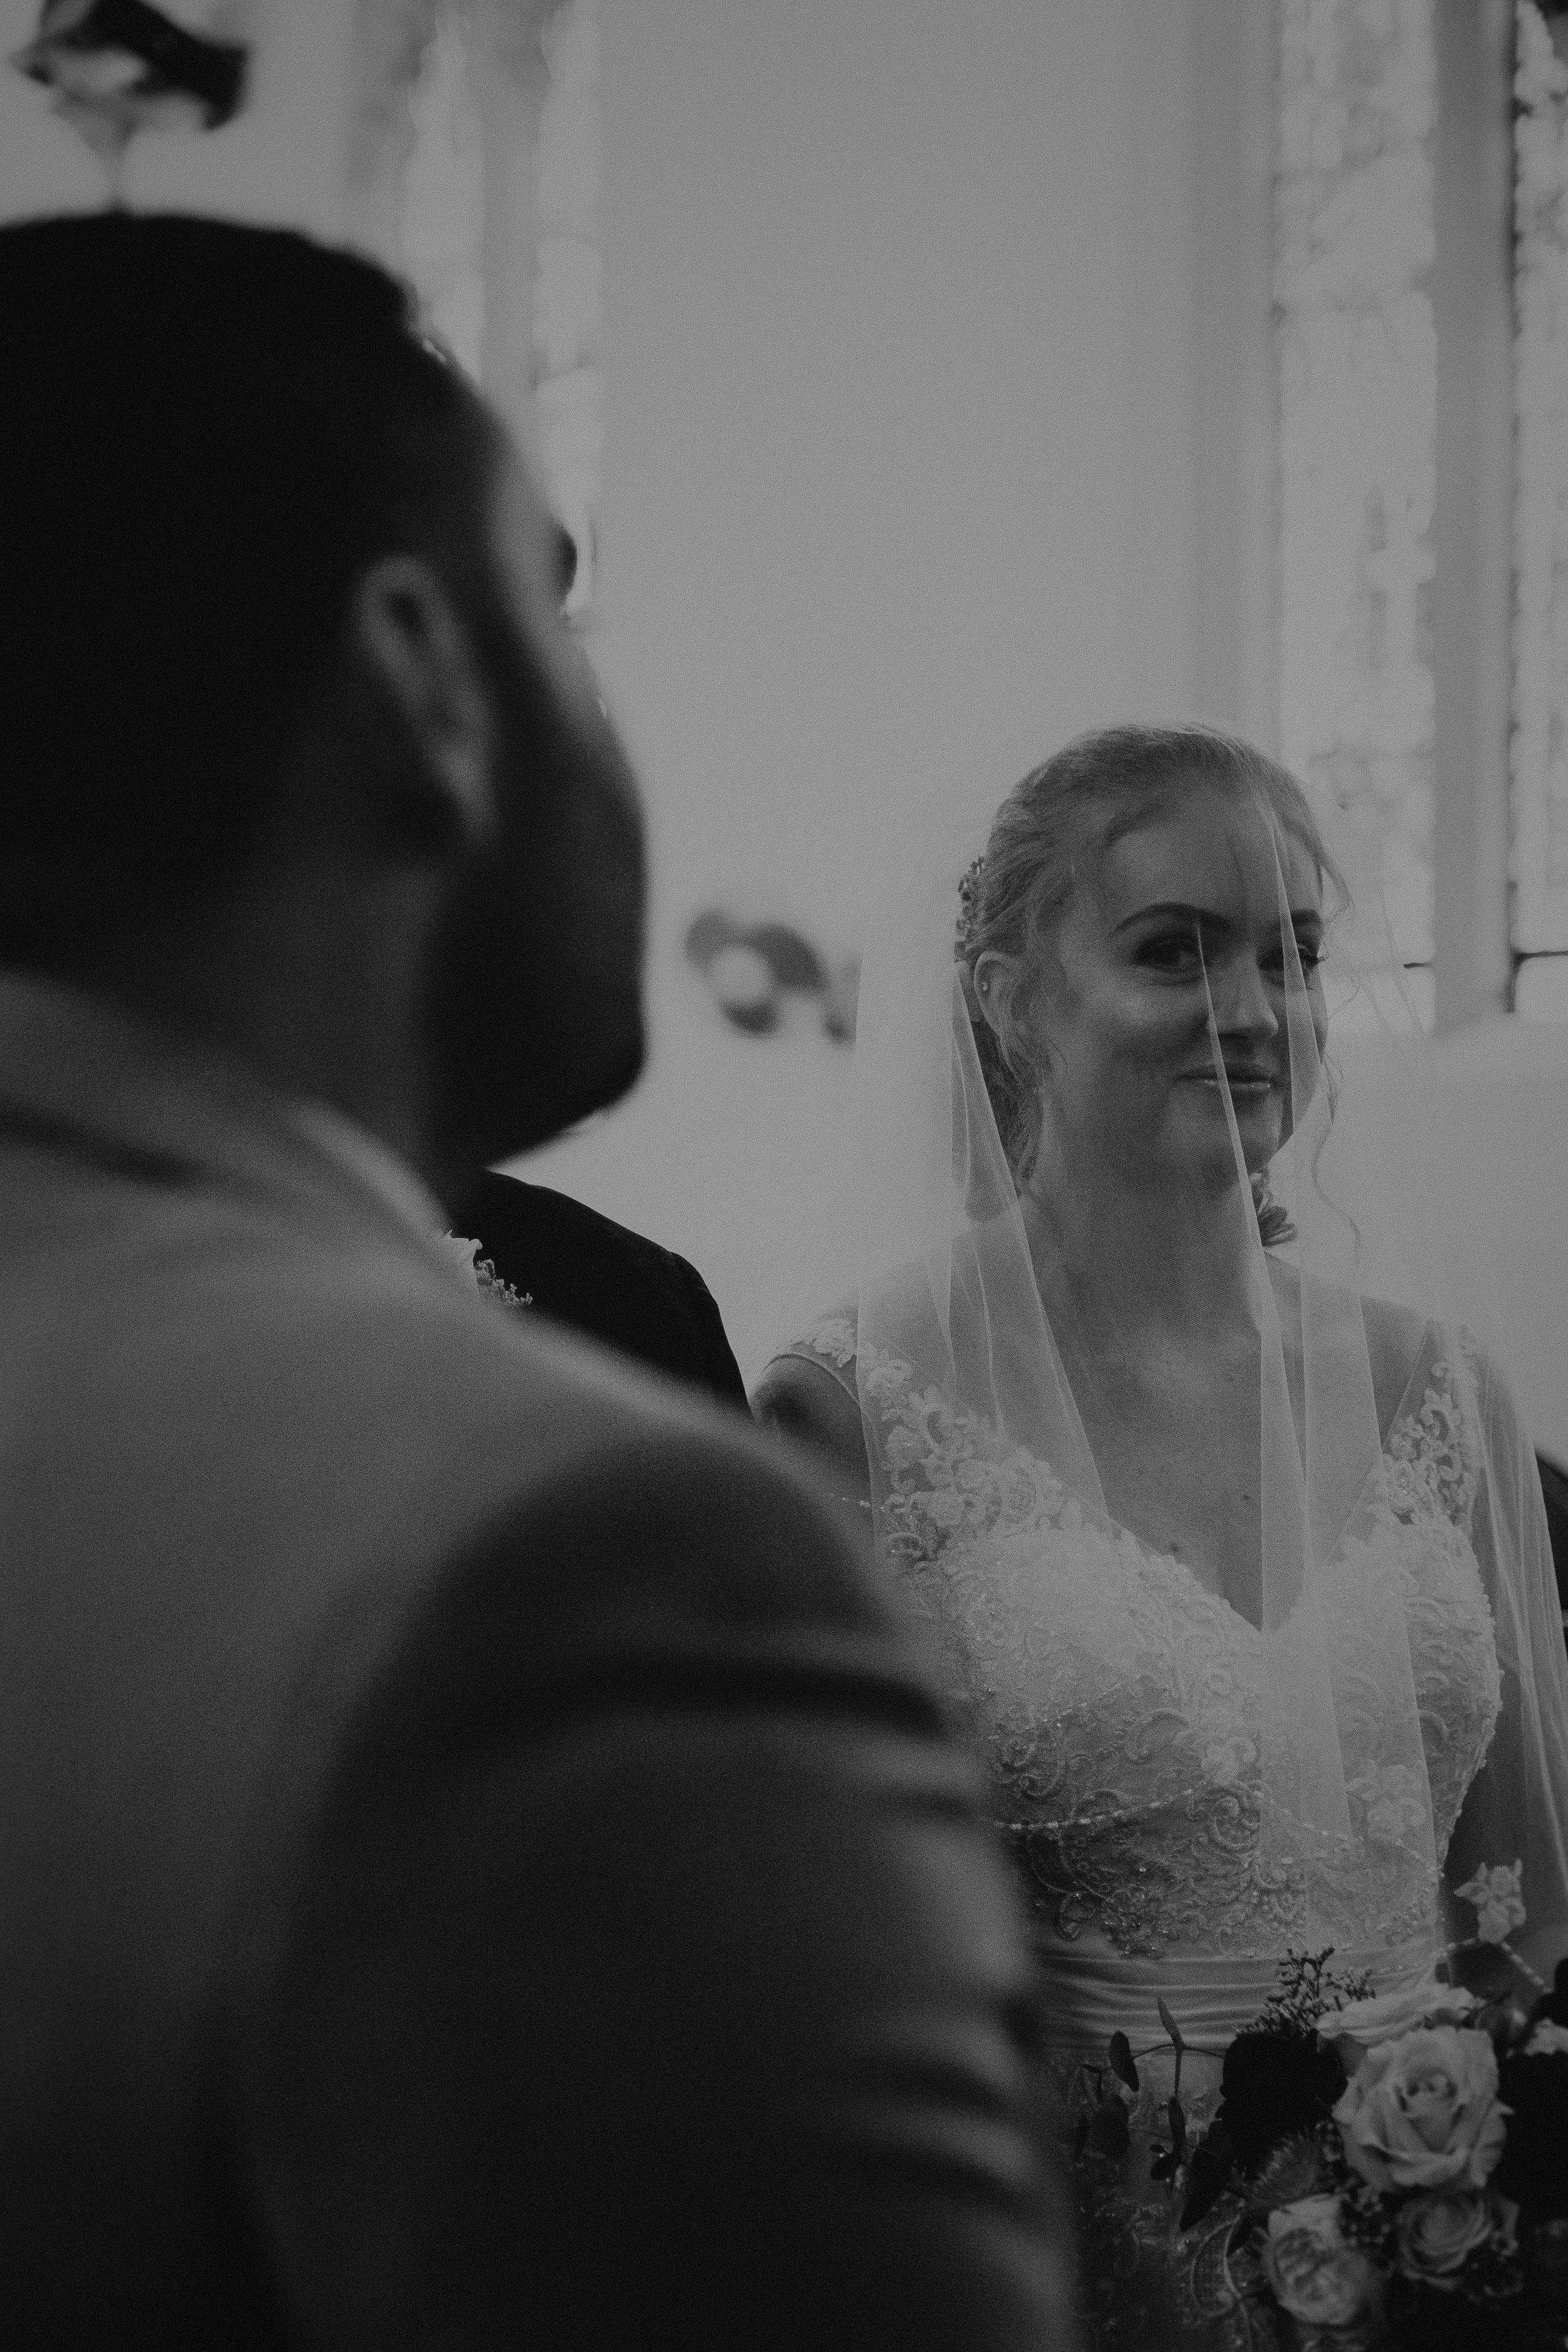 sav & mike_elopement wedding photography_kings & thieves_blog (6 of 44).jpg